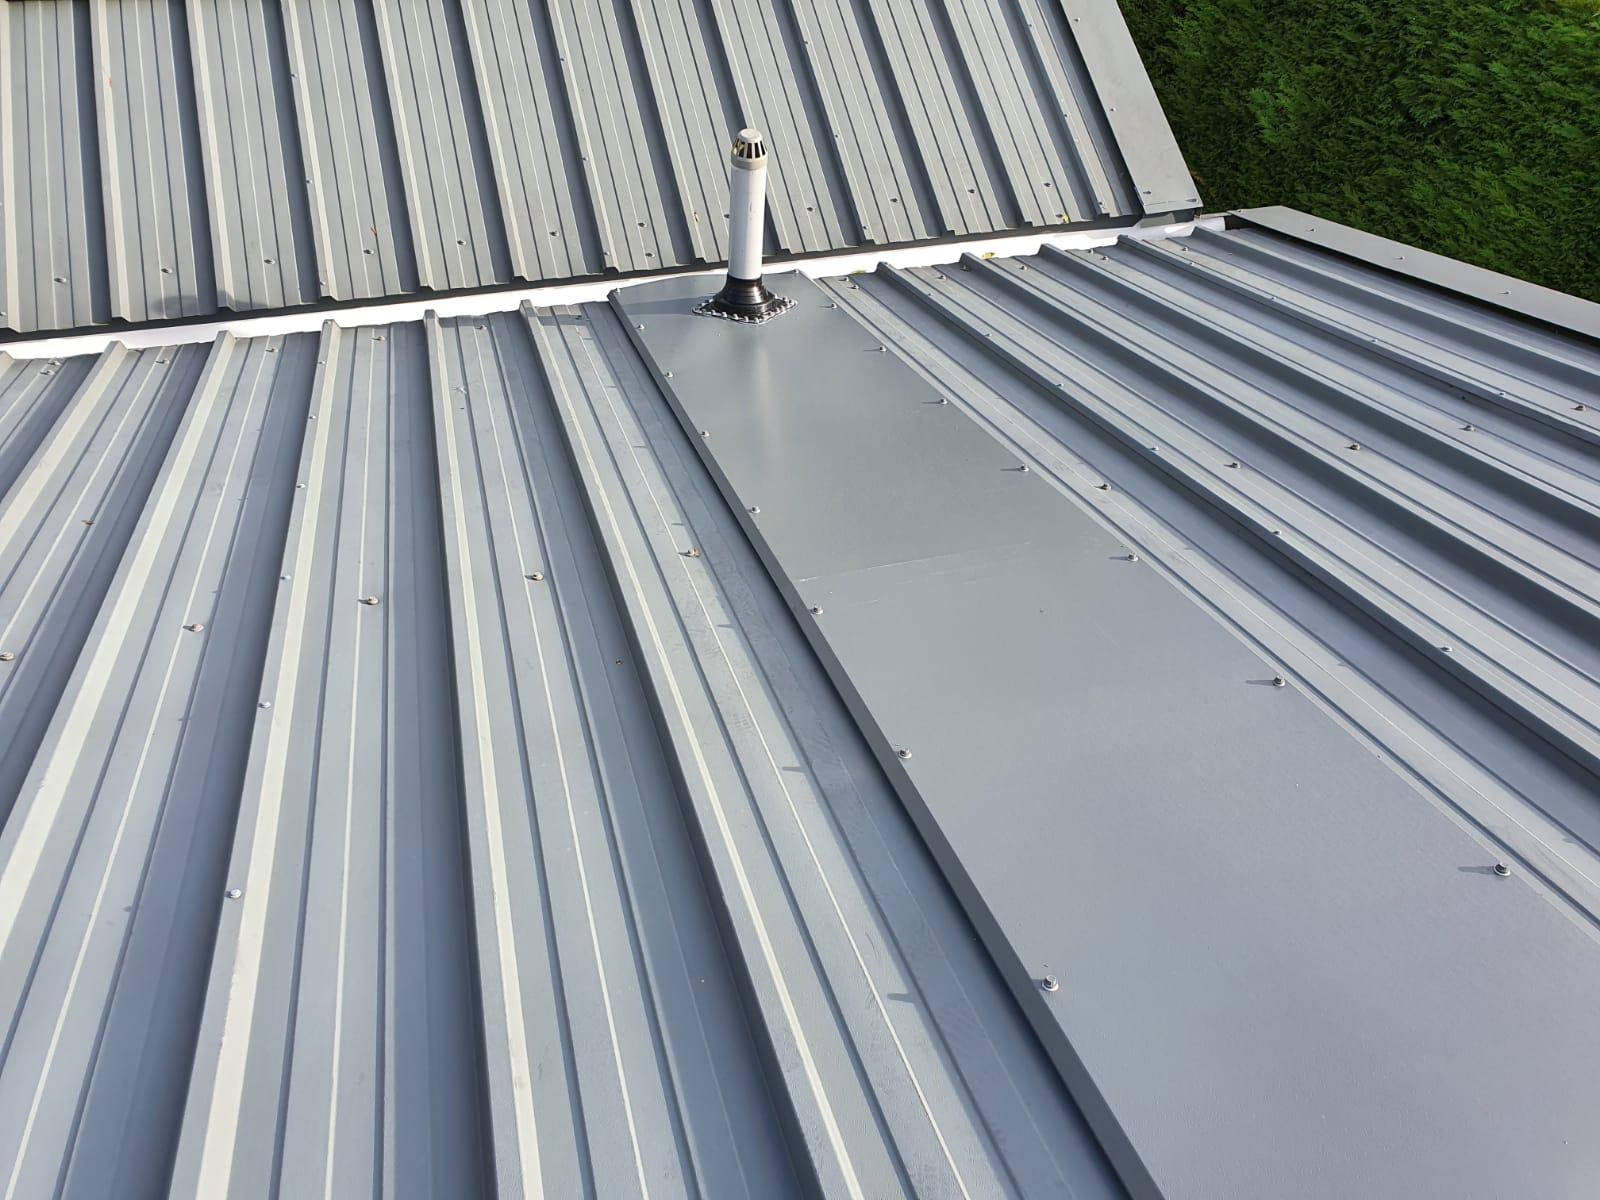 Roof repair work to an office roof in Bearstead Maidstone Kent